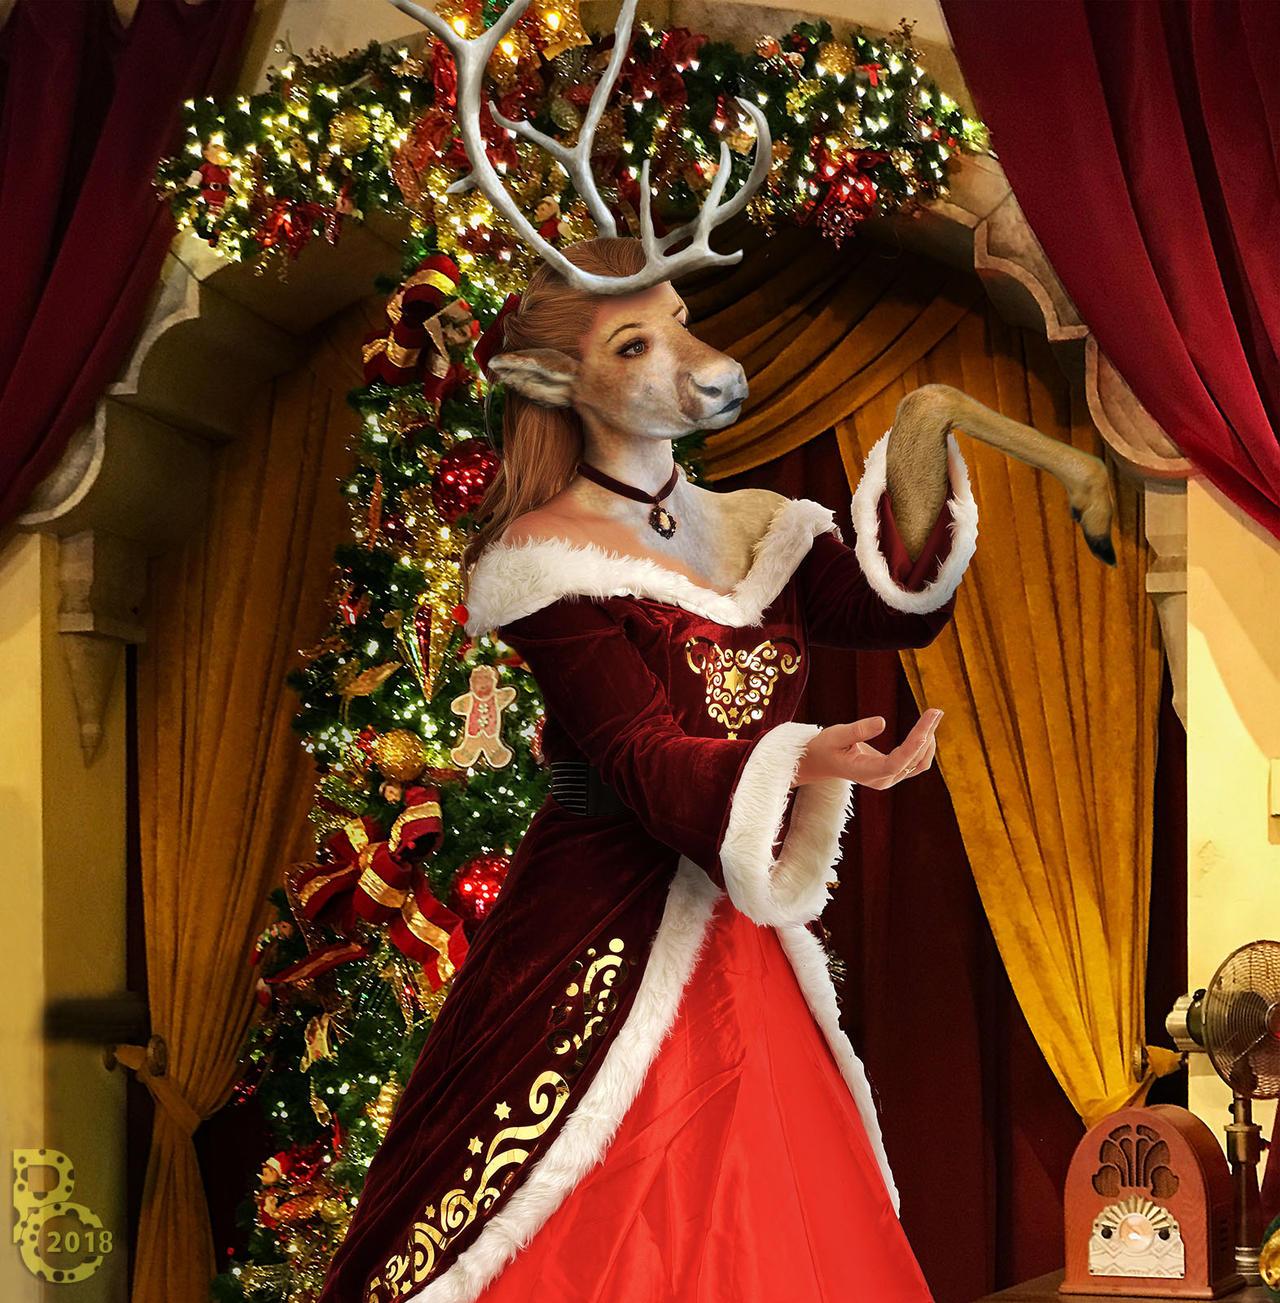 Reindeer For Christmas By Pythos Cheetah On Deviantart